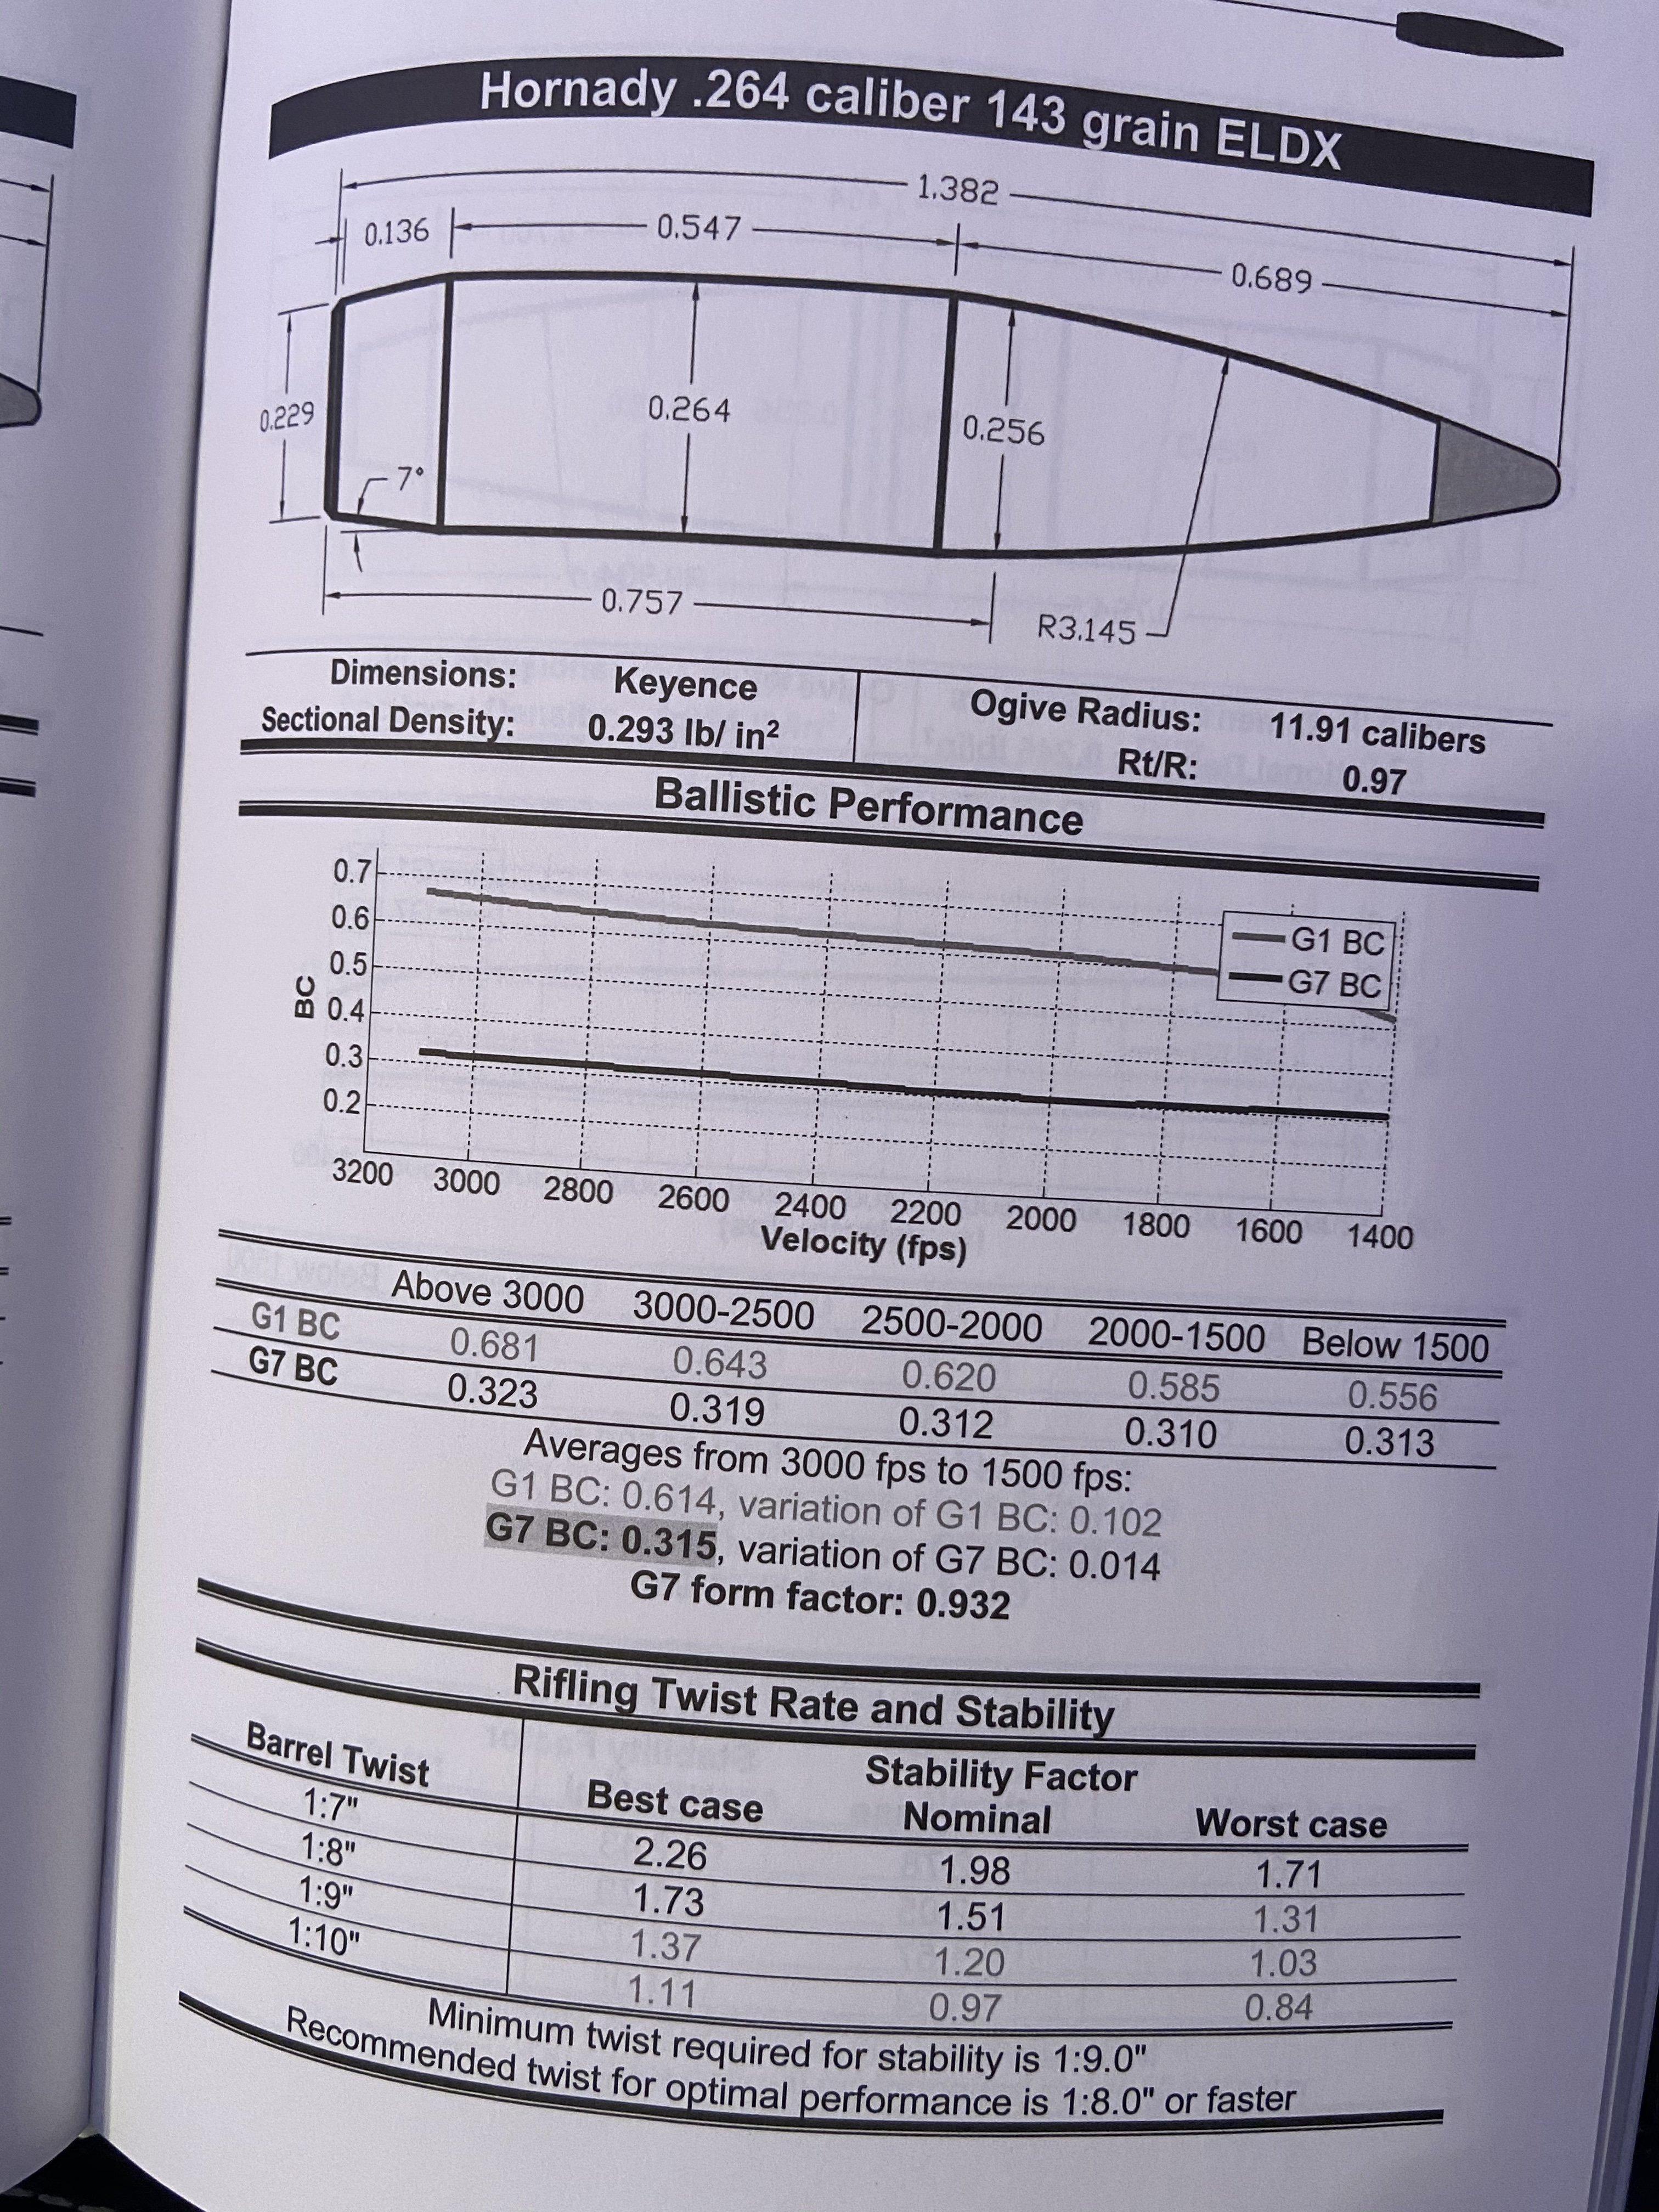 0E2D9AA5-A7E3-4C15-89E9-FCD53B177DBC.jpeg